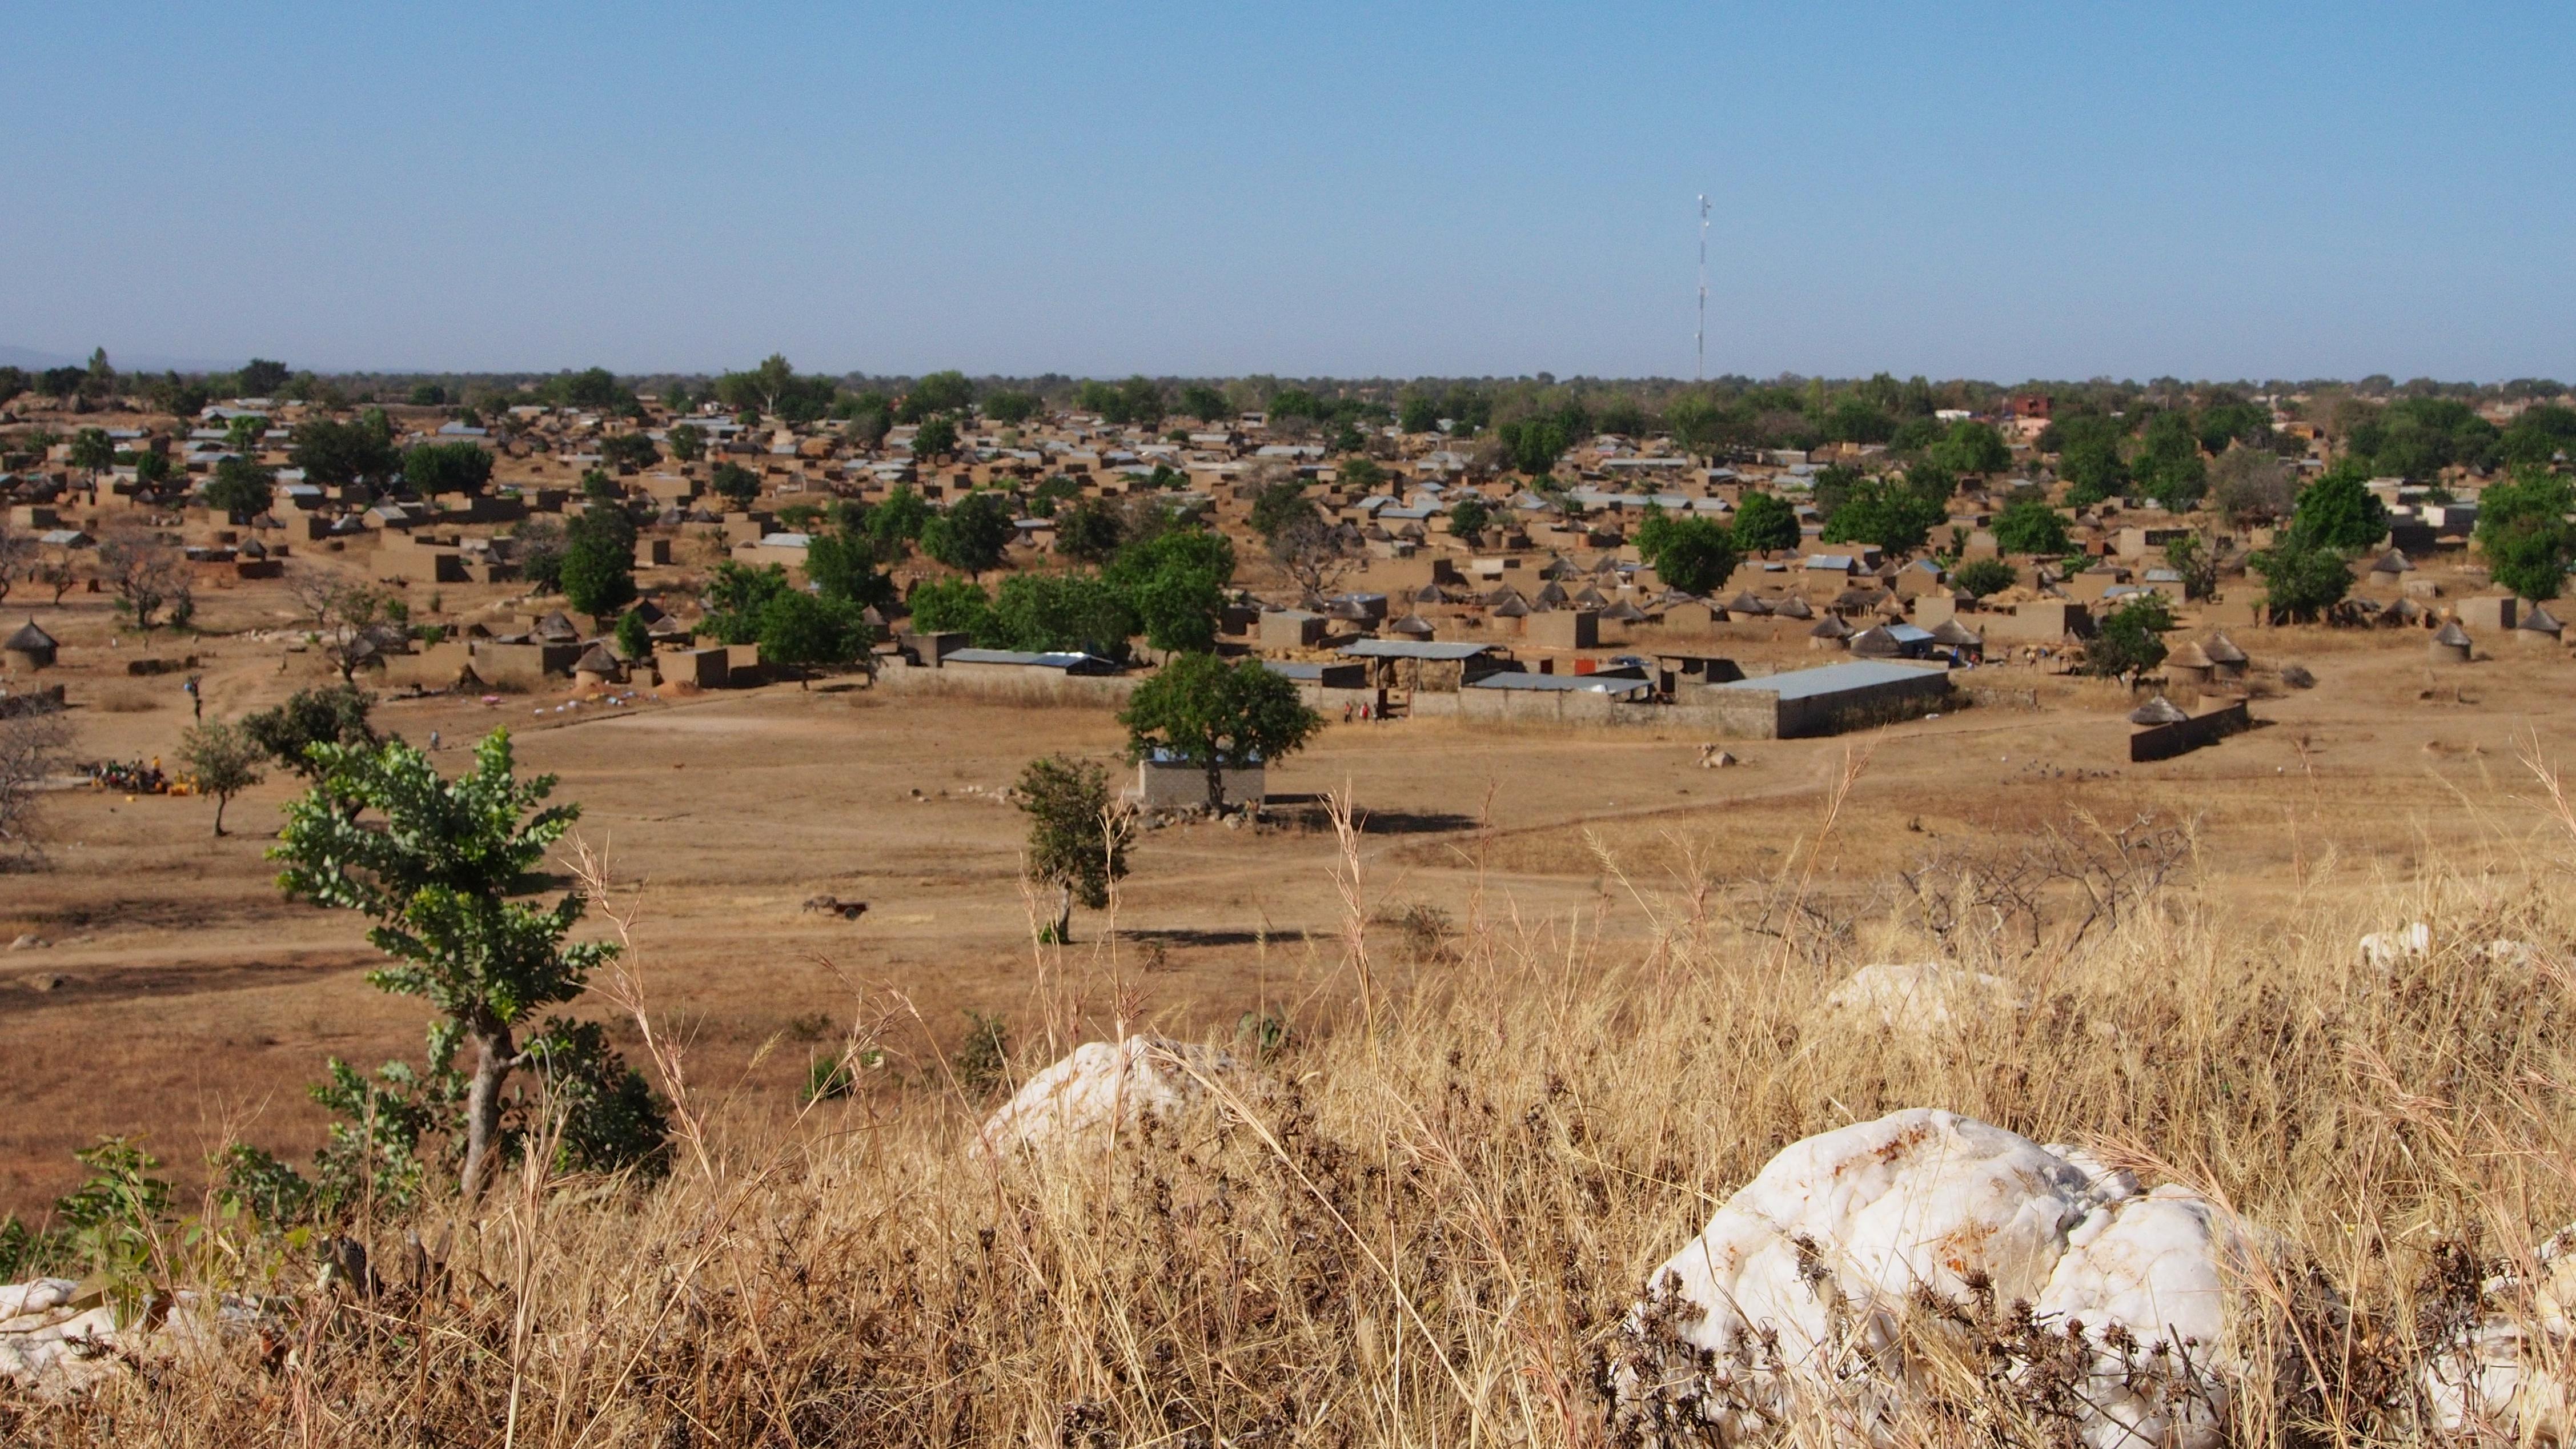 Bitou (Burkina Faso)